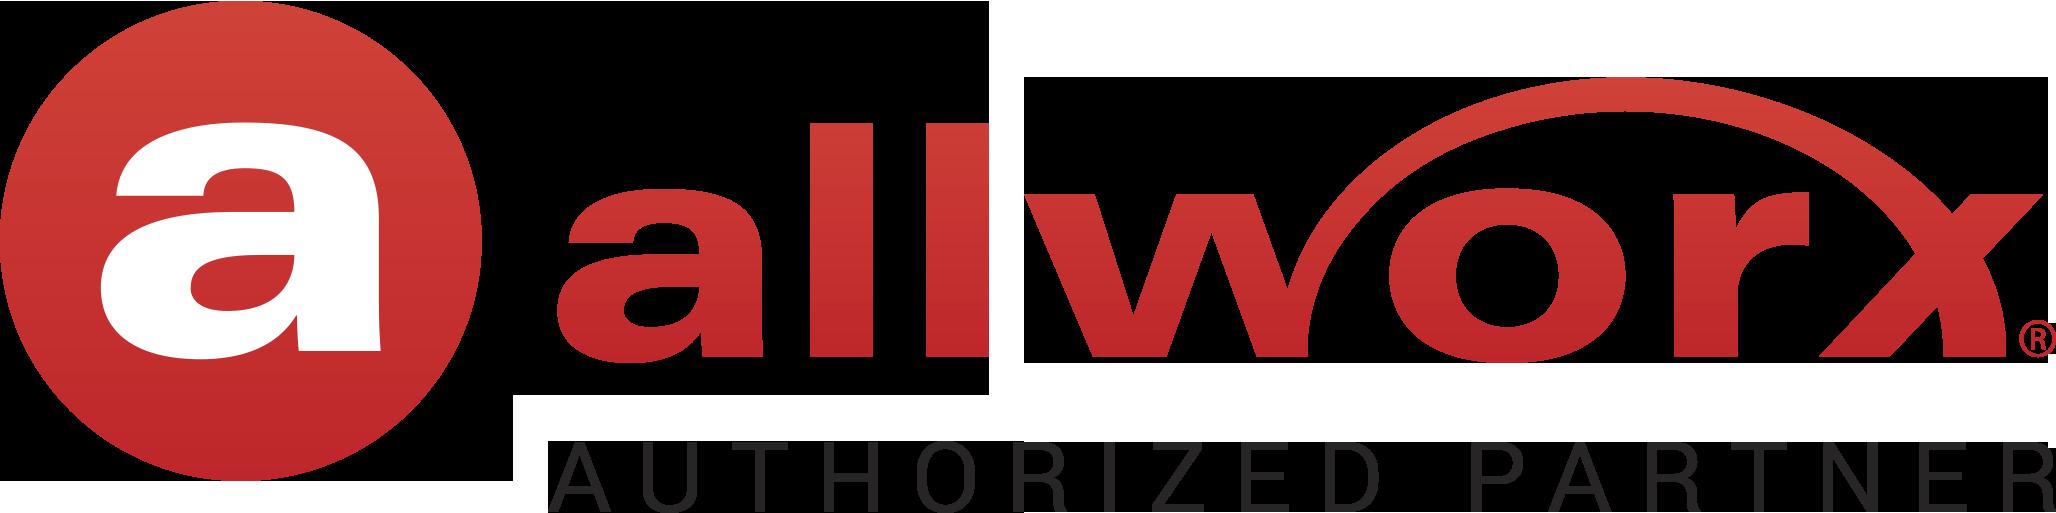 Allworx_Partner_LG_HORZ_RED.png